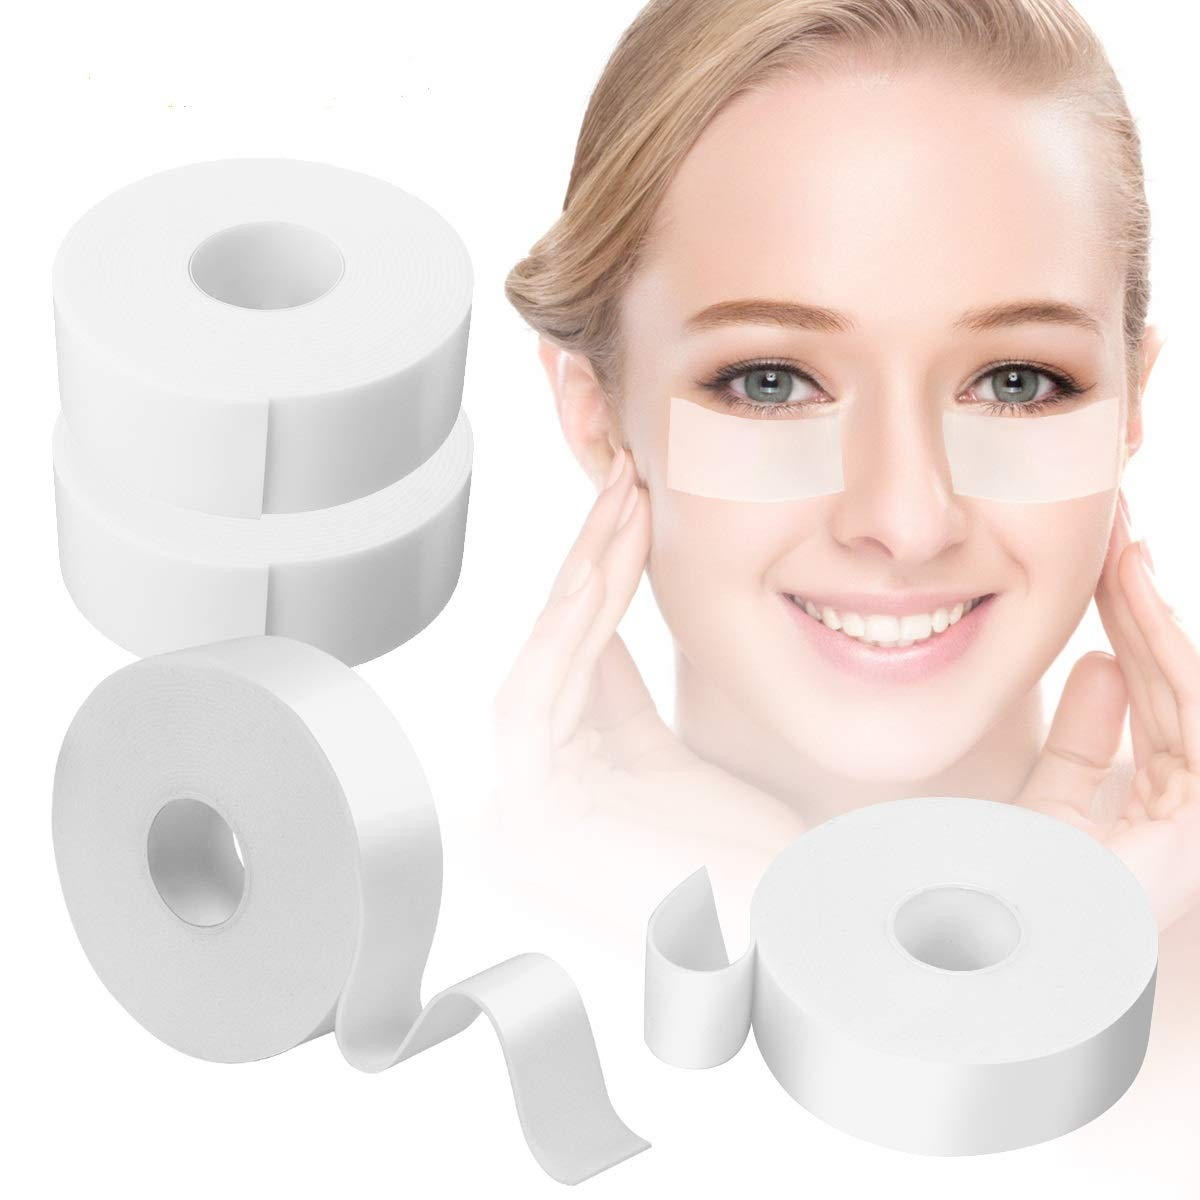 XREXS Eyelash Extension Tape, 4 Rolls Medical Foam Lash Tape Lint Free Eyelash Extension Supplies Lash Pads for Sensitive Skin 1 inch x 5.5 yd